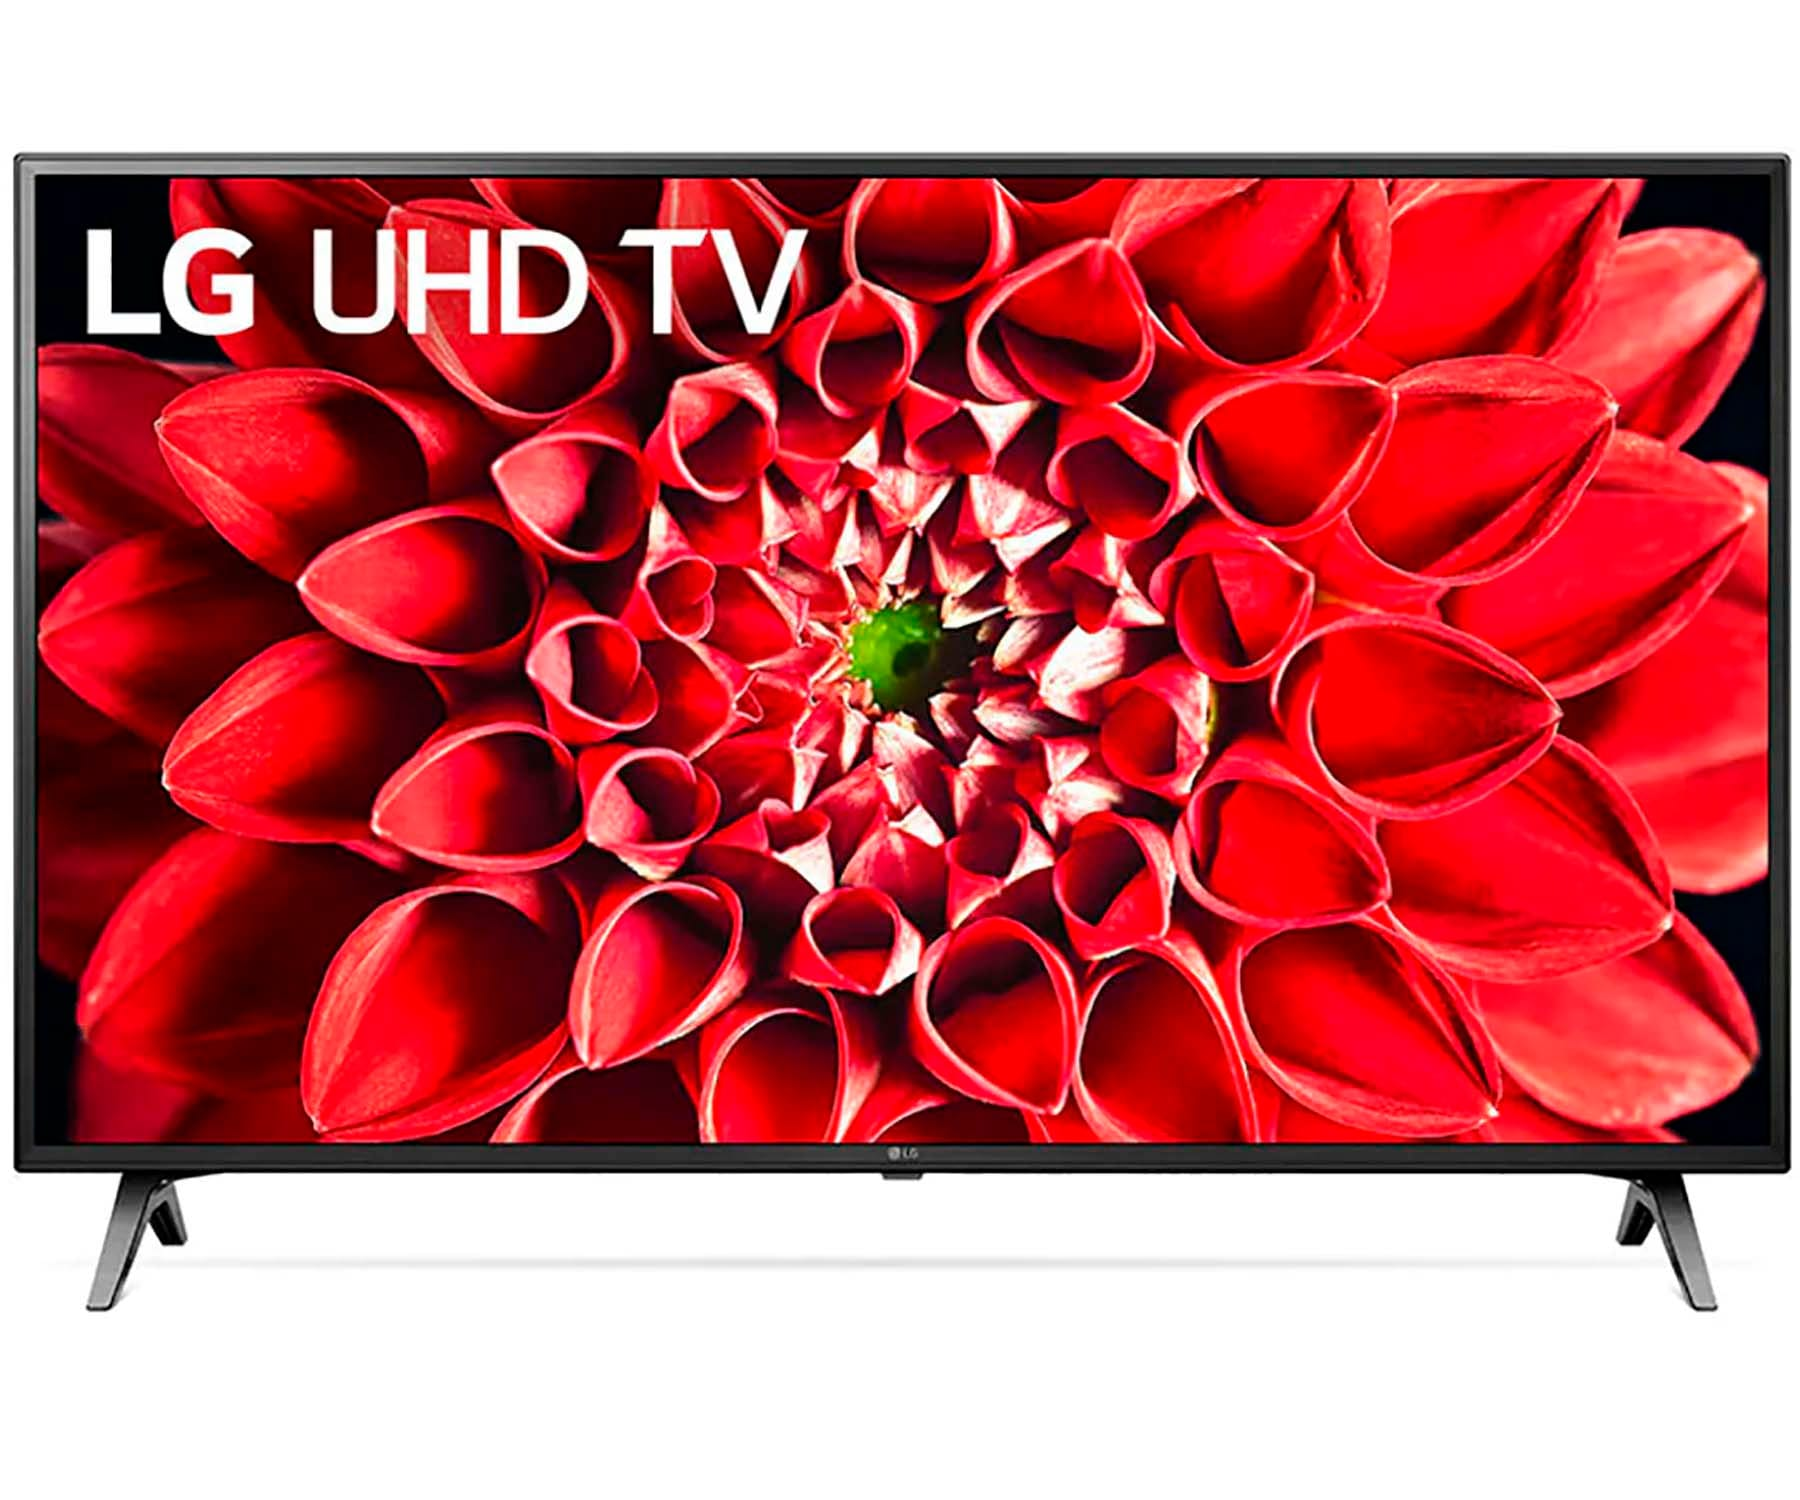 LG 49UN71006LB TELEVISOR 49'' LED UHD 4K SMART TV WEBOS 5.0 WIFI HDMI BLUETOOTH